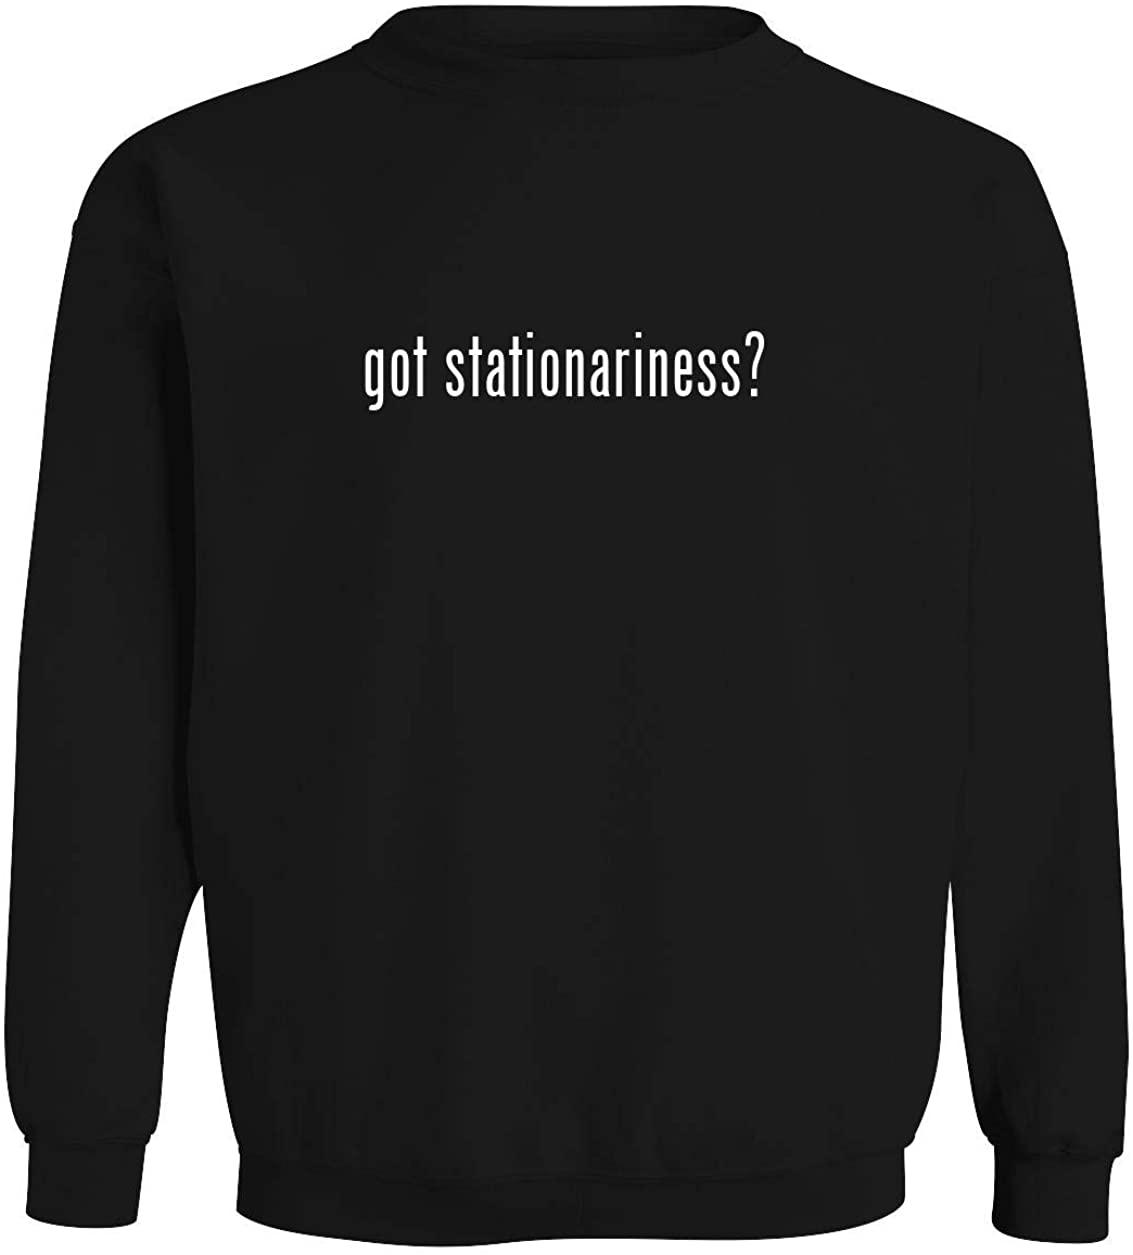 got stationariness? - Men's Soft & Comfortable Long Sleeve T-Shirt